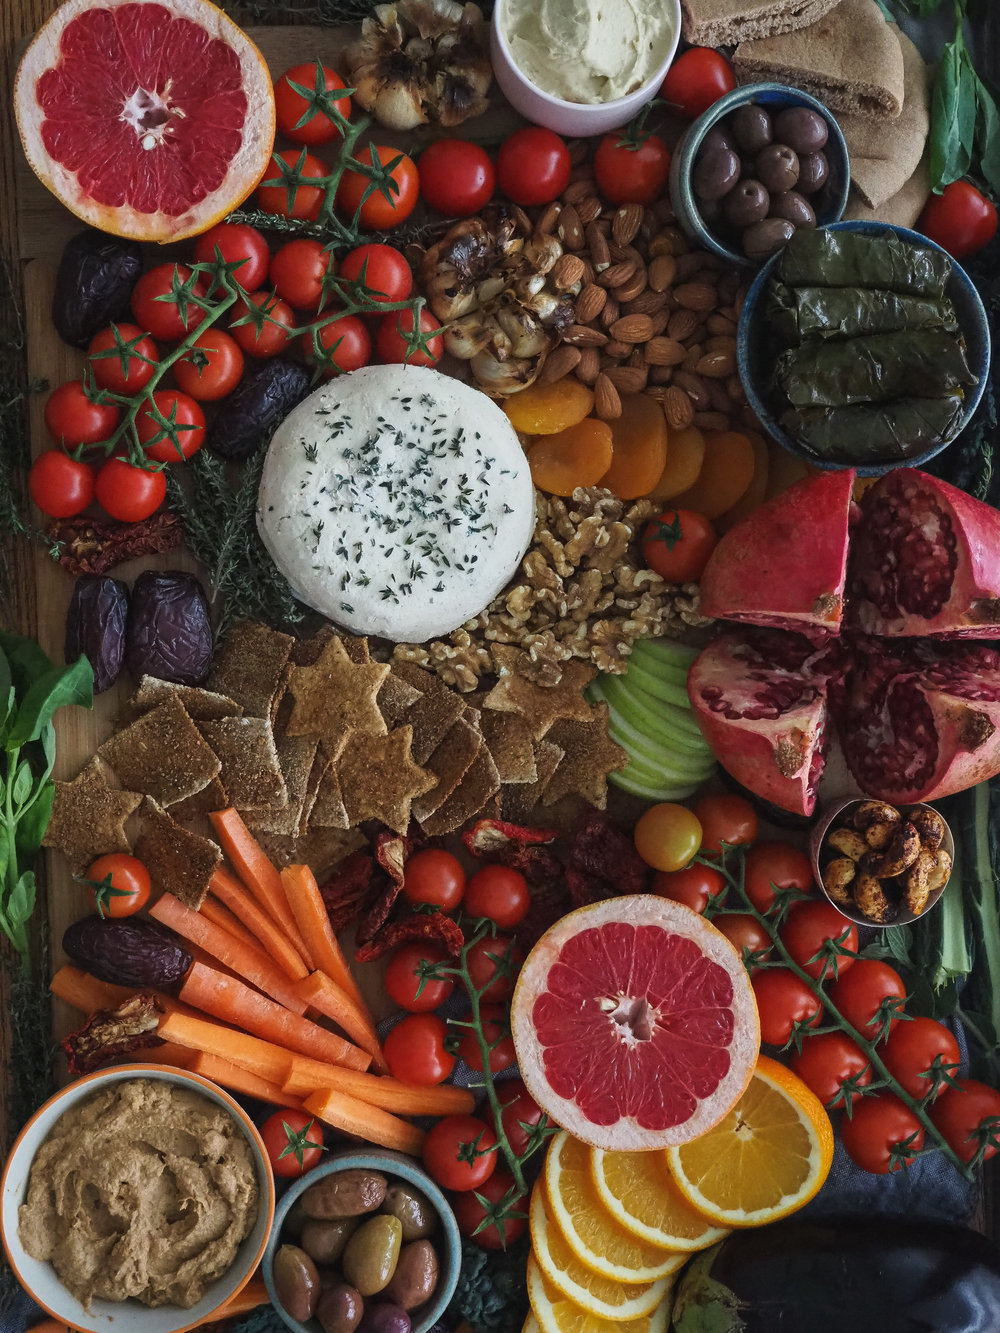 Vegan Appetizer Party Platter / Snack Board Spread   Plant-Based, Homemade  All Rights Reserved © Elena Hollenhorst